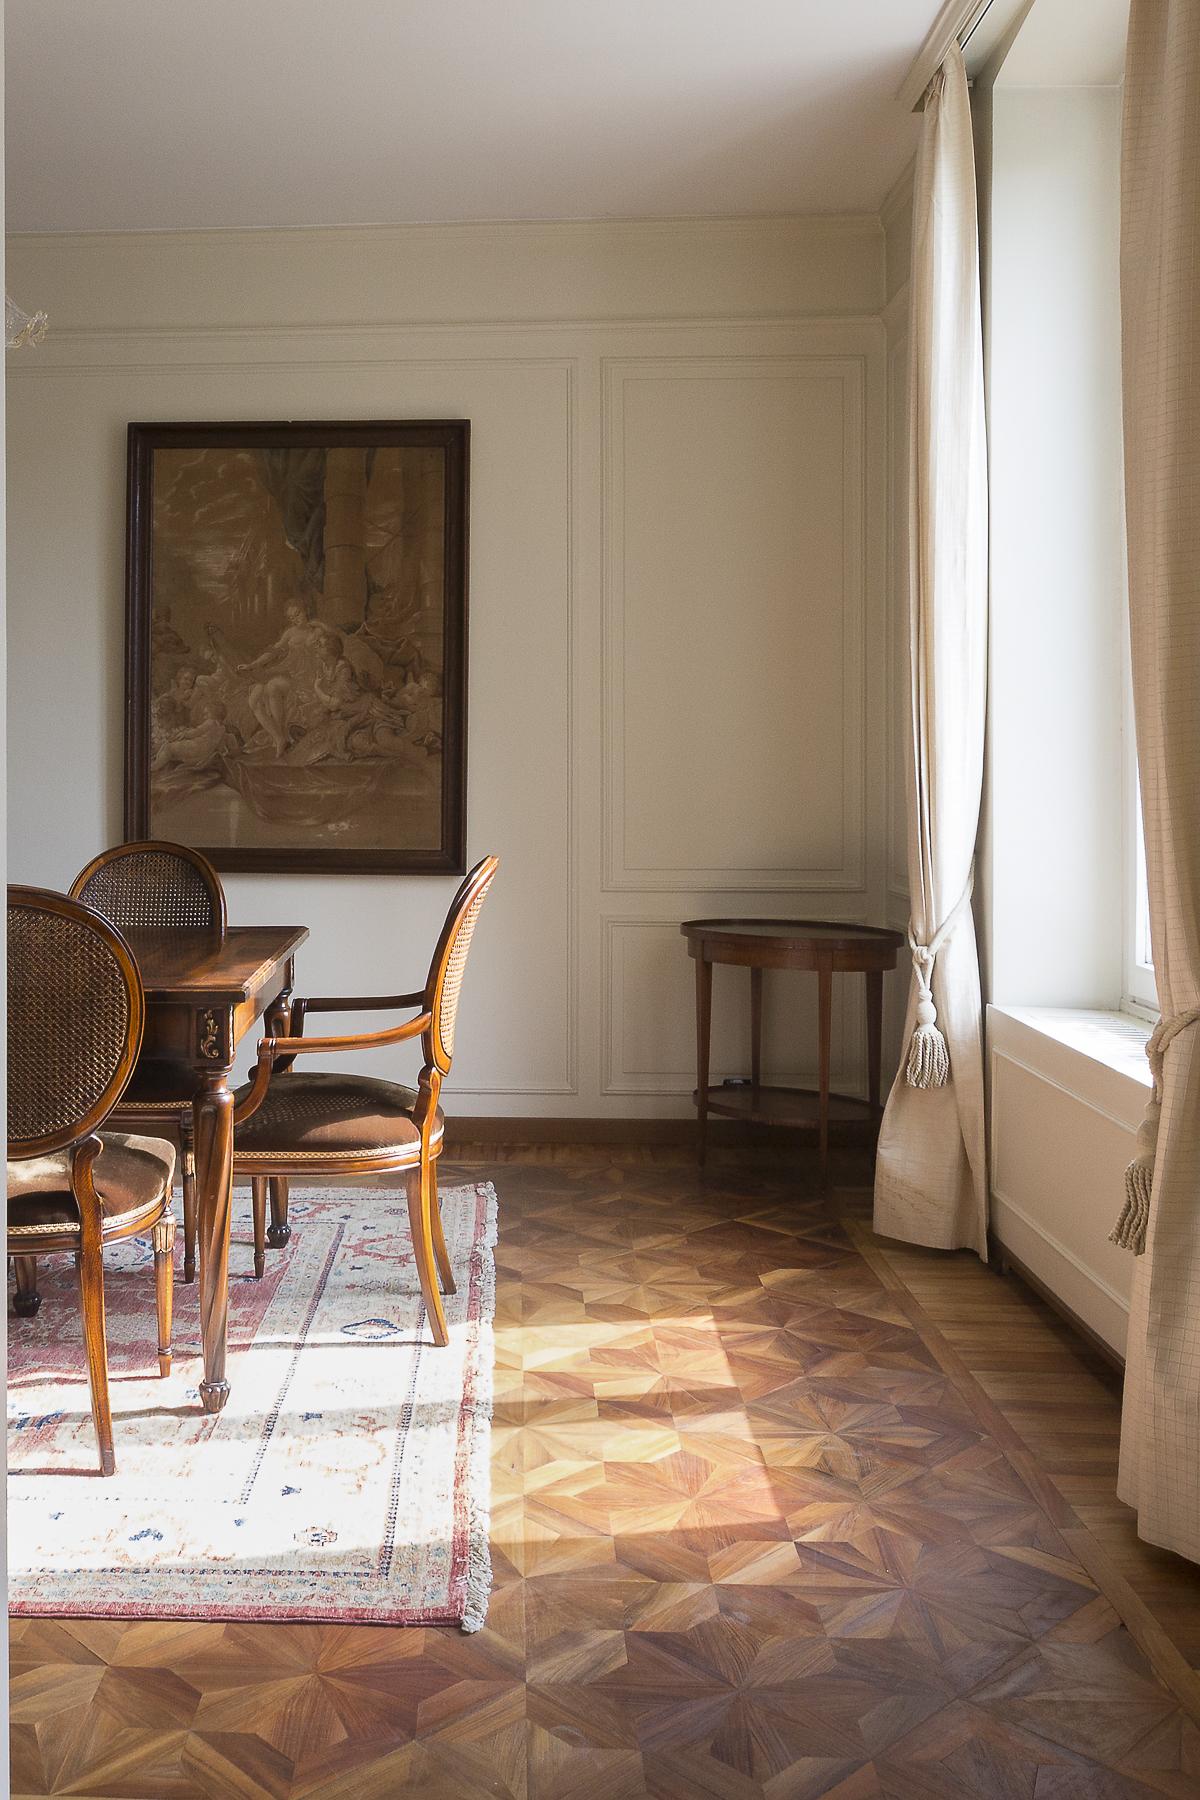 Additional photo for property listing at Prestigious apartament in elegant historical building Corso Sempione Milano, Milan 20145 Italie